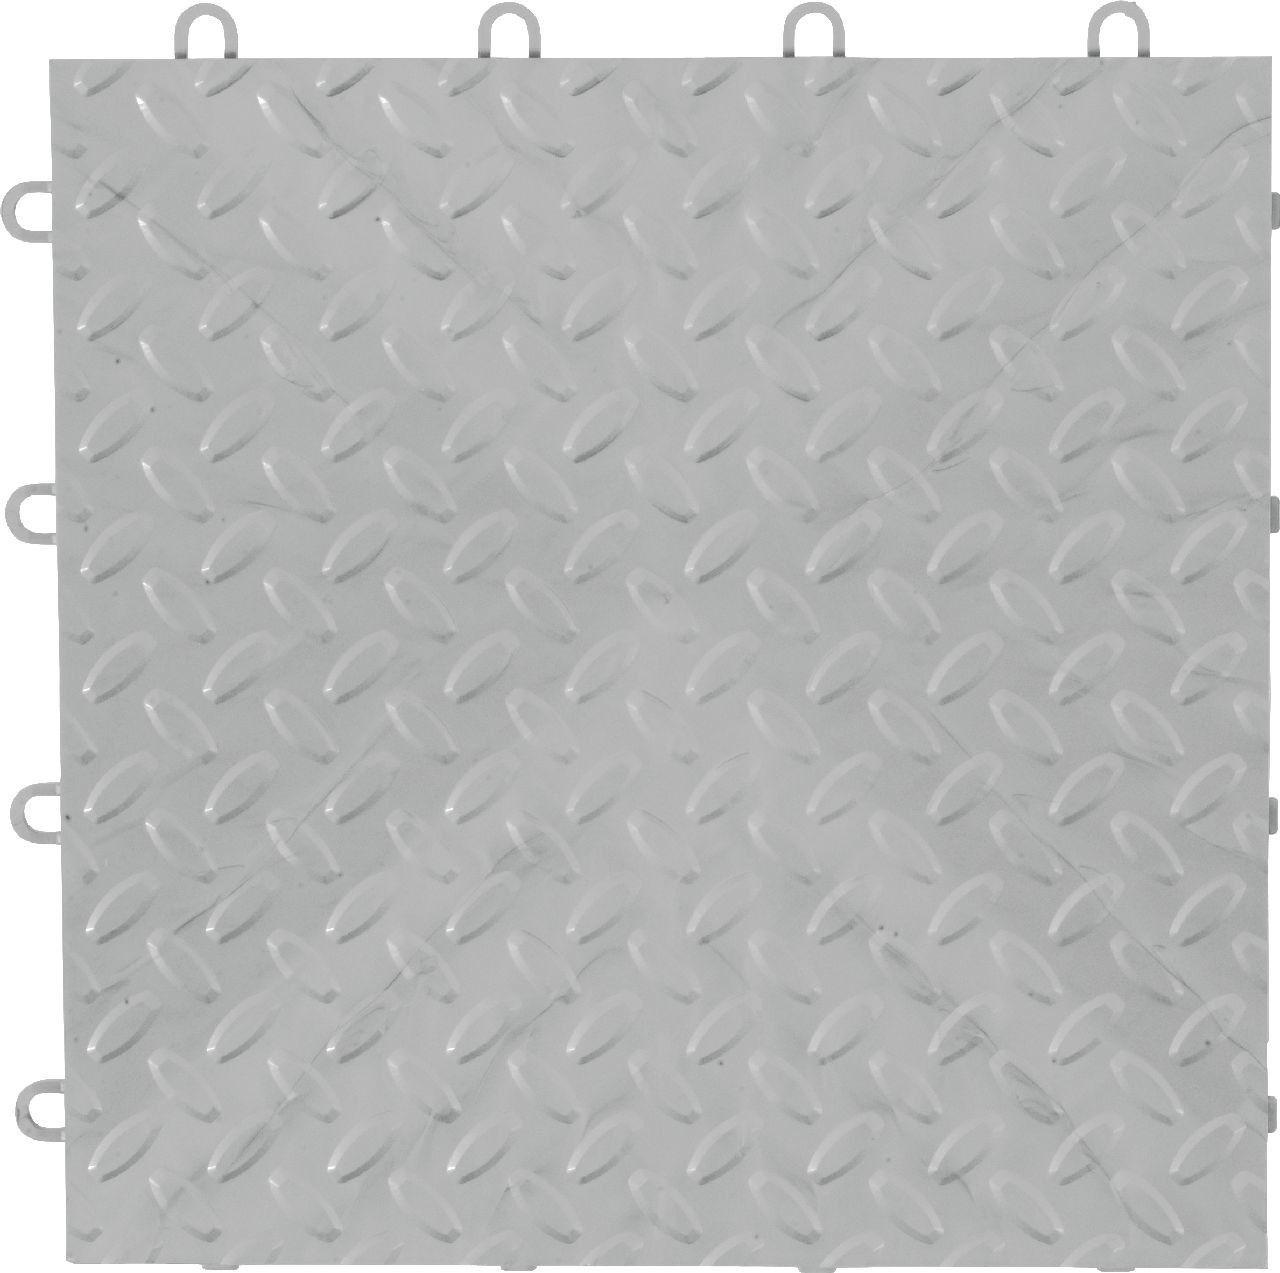 4 pack garage floor tile products 4 pack garage floor tile dailygadgetfo Gallery